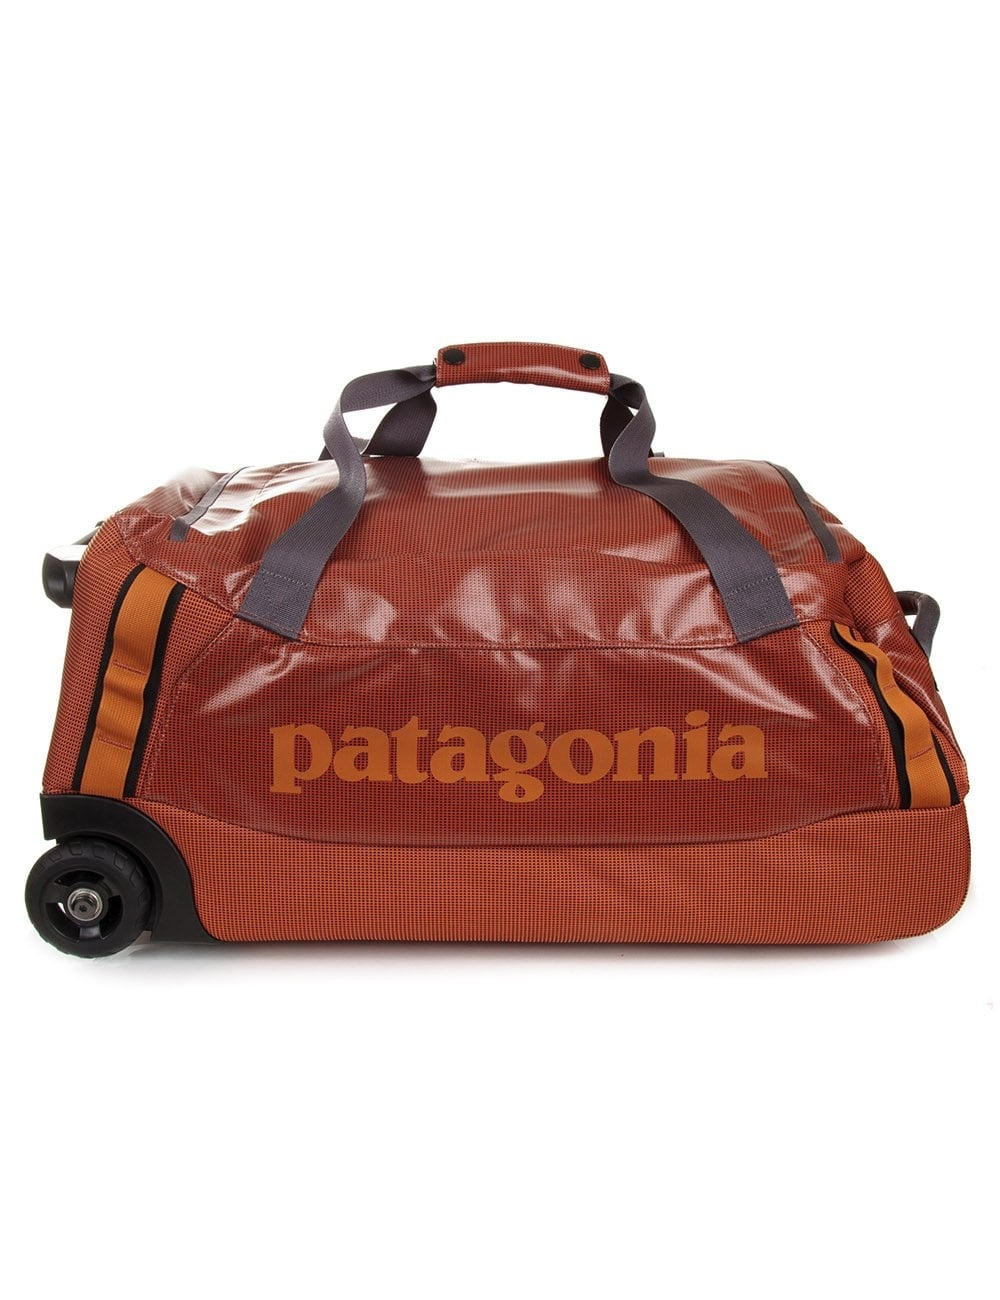 Patagonia Black Hole 45l Wheeled Duffel Bag Copper Ore